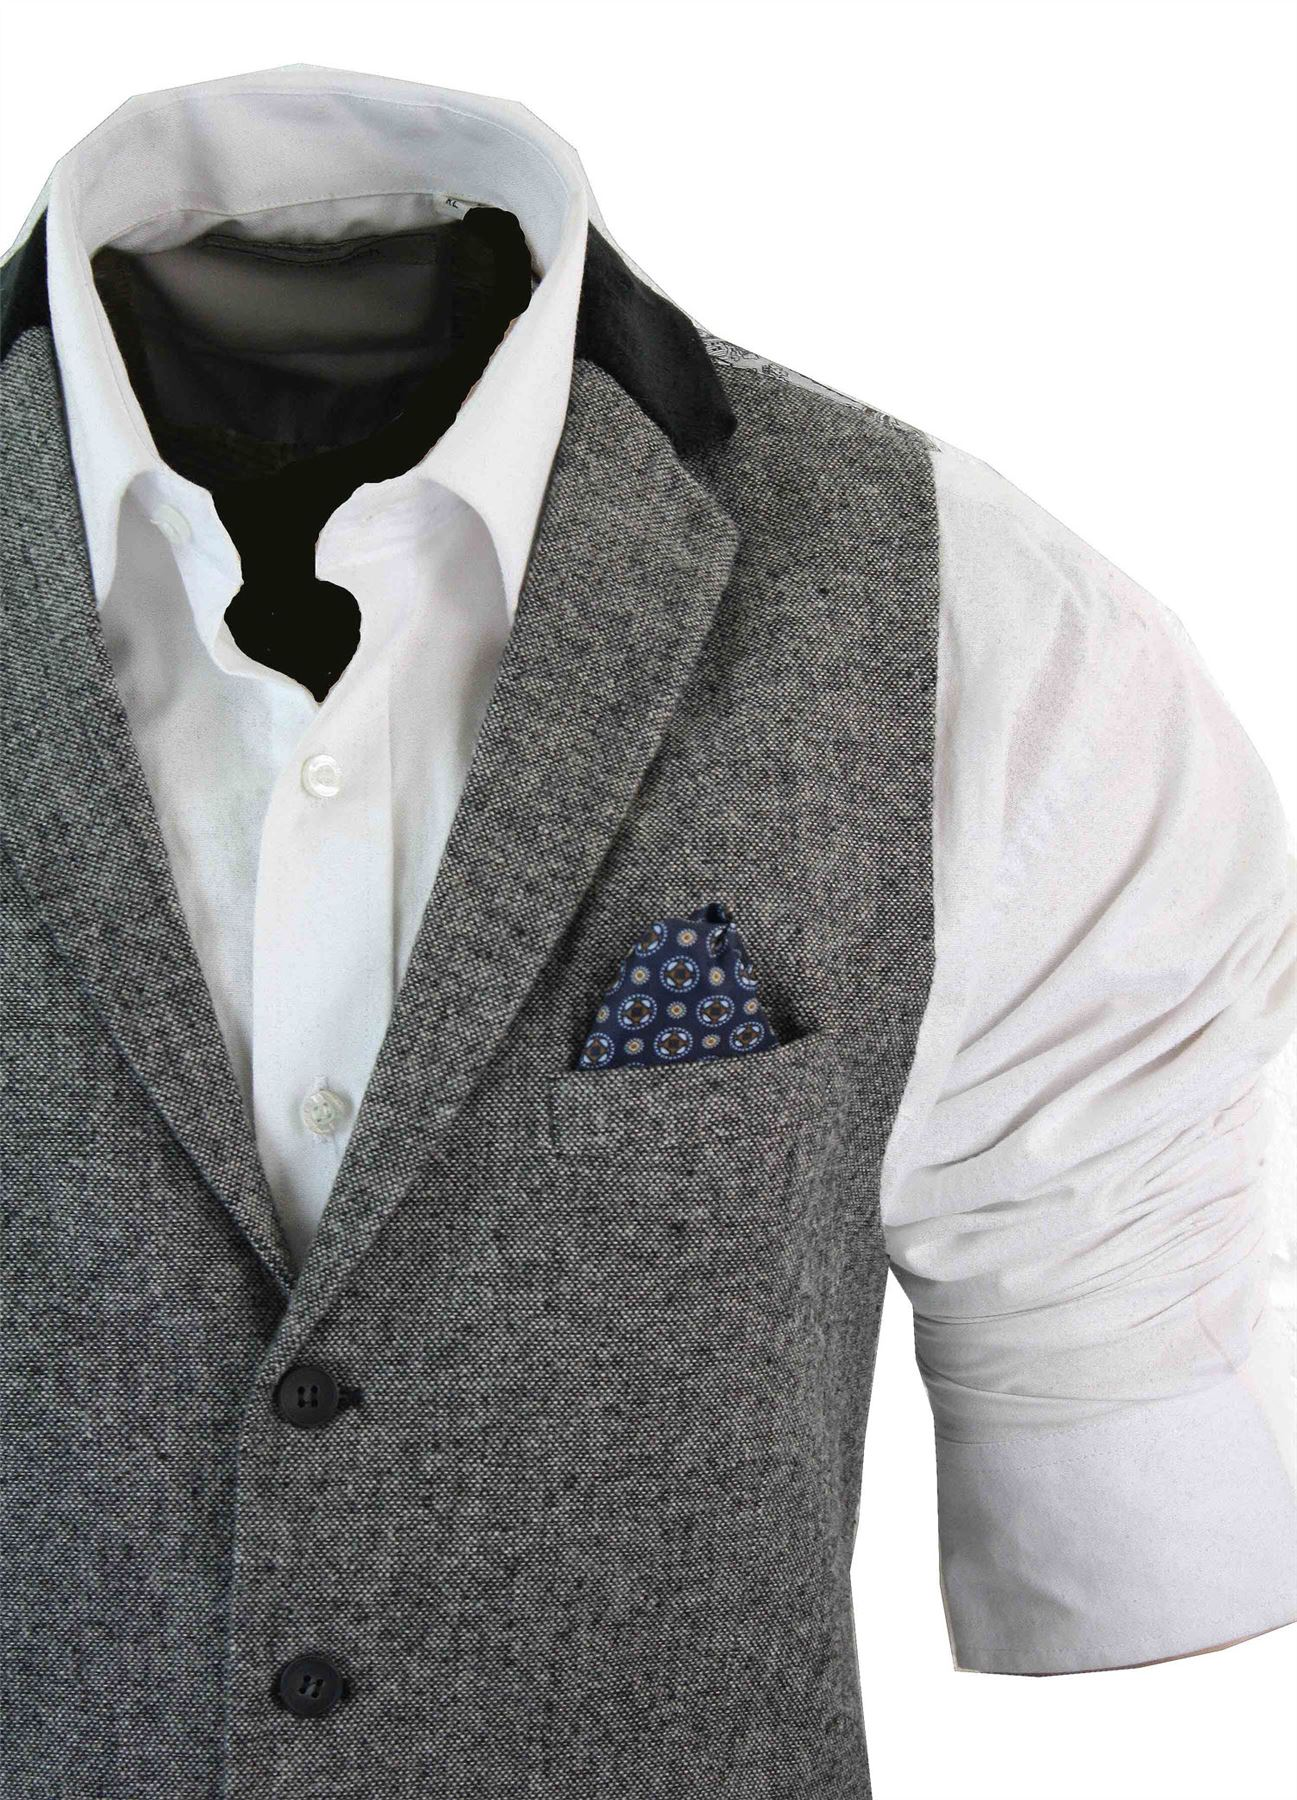 gilet homme veston tweed chevrons velours c tel laine coupe cintr e r tro ebay. Black Bedroom Furniture Sets. Home Design Ideas